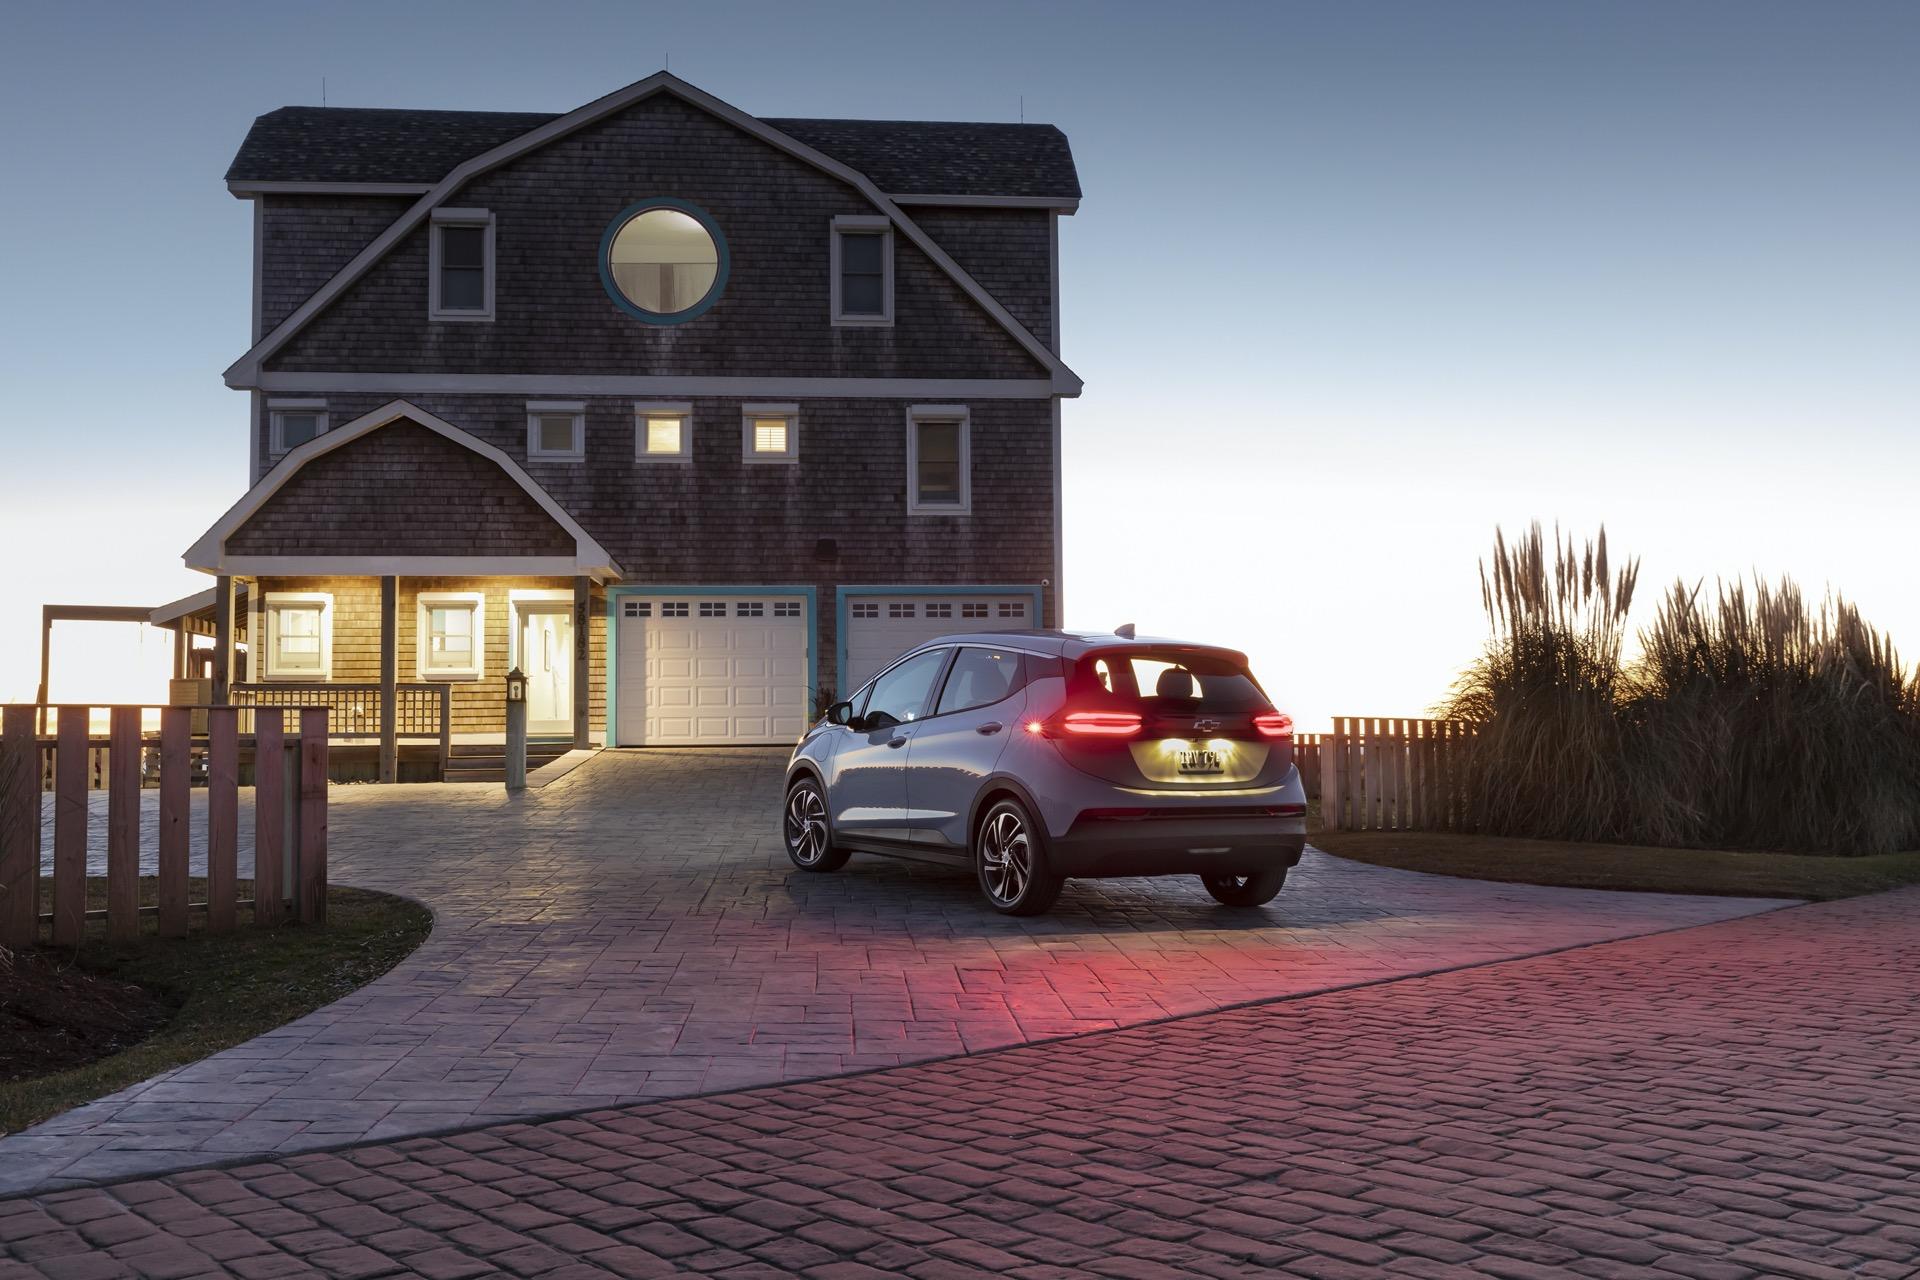 GM free charging, Jaguar EVs, Canoo vs. Tesla structural battery: Today's Car News